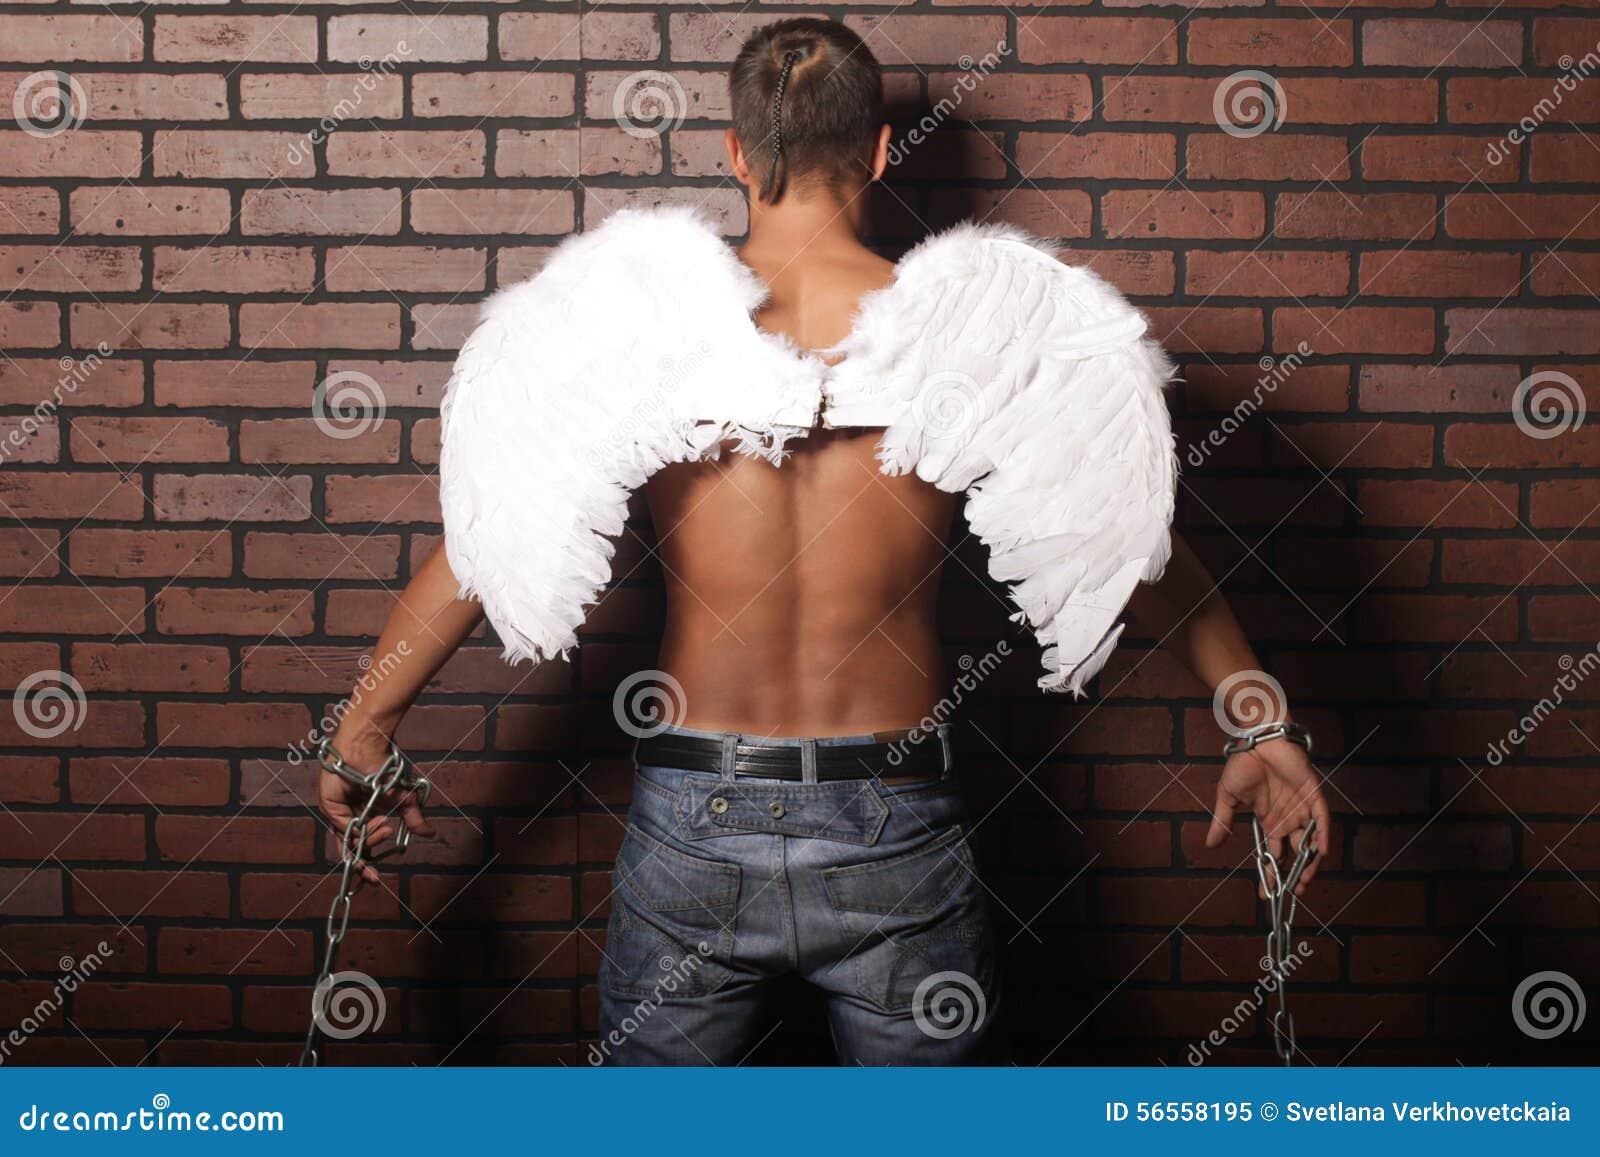 Download Άγγελος ατόμων στοκ εικόνα. εικόνα από μαύρα, ισχύς, μέταλλο - 56558195